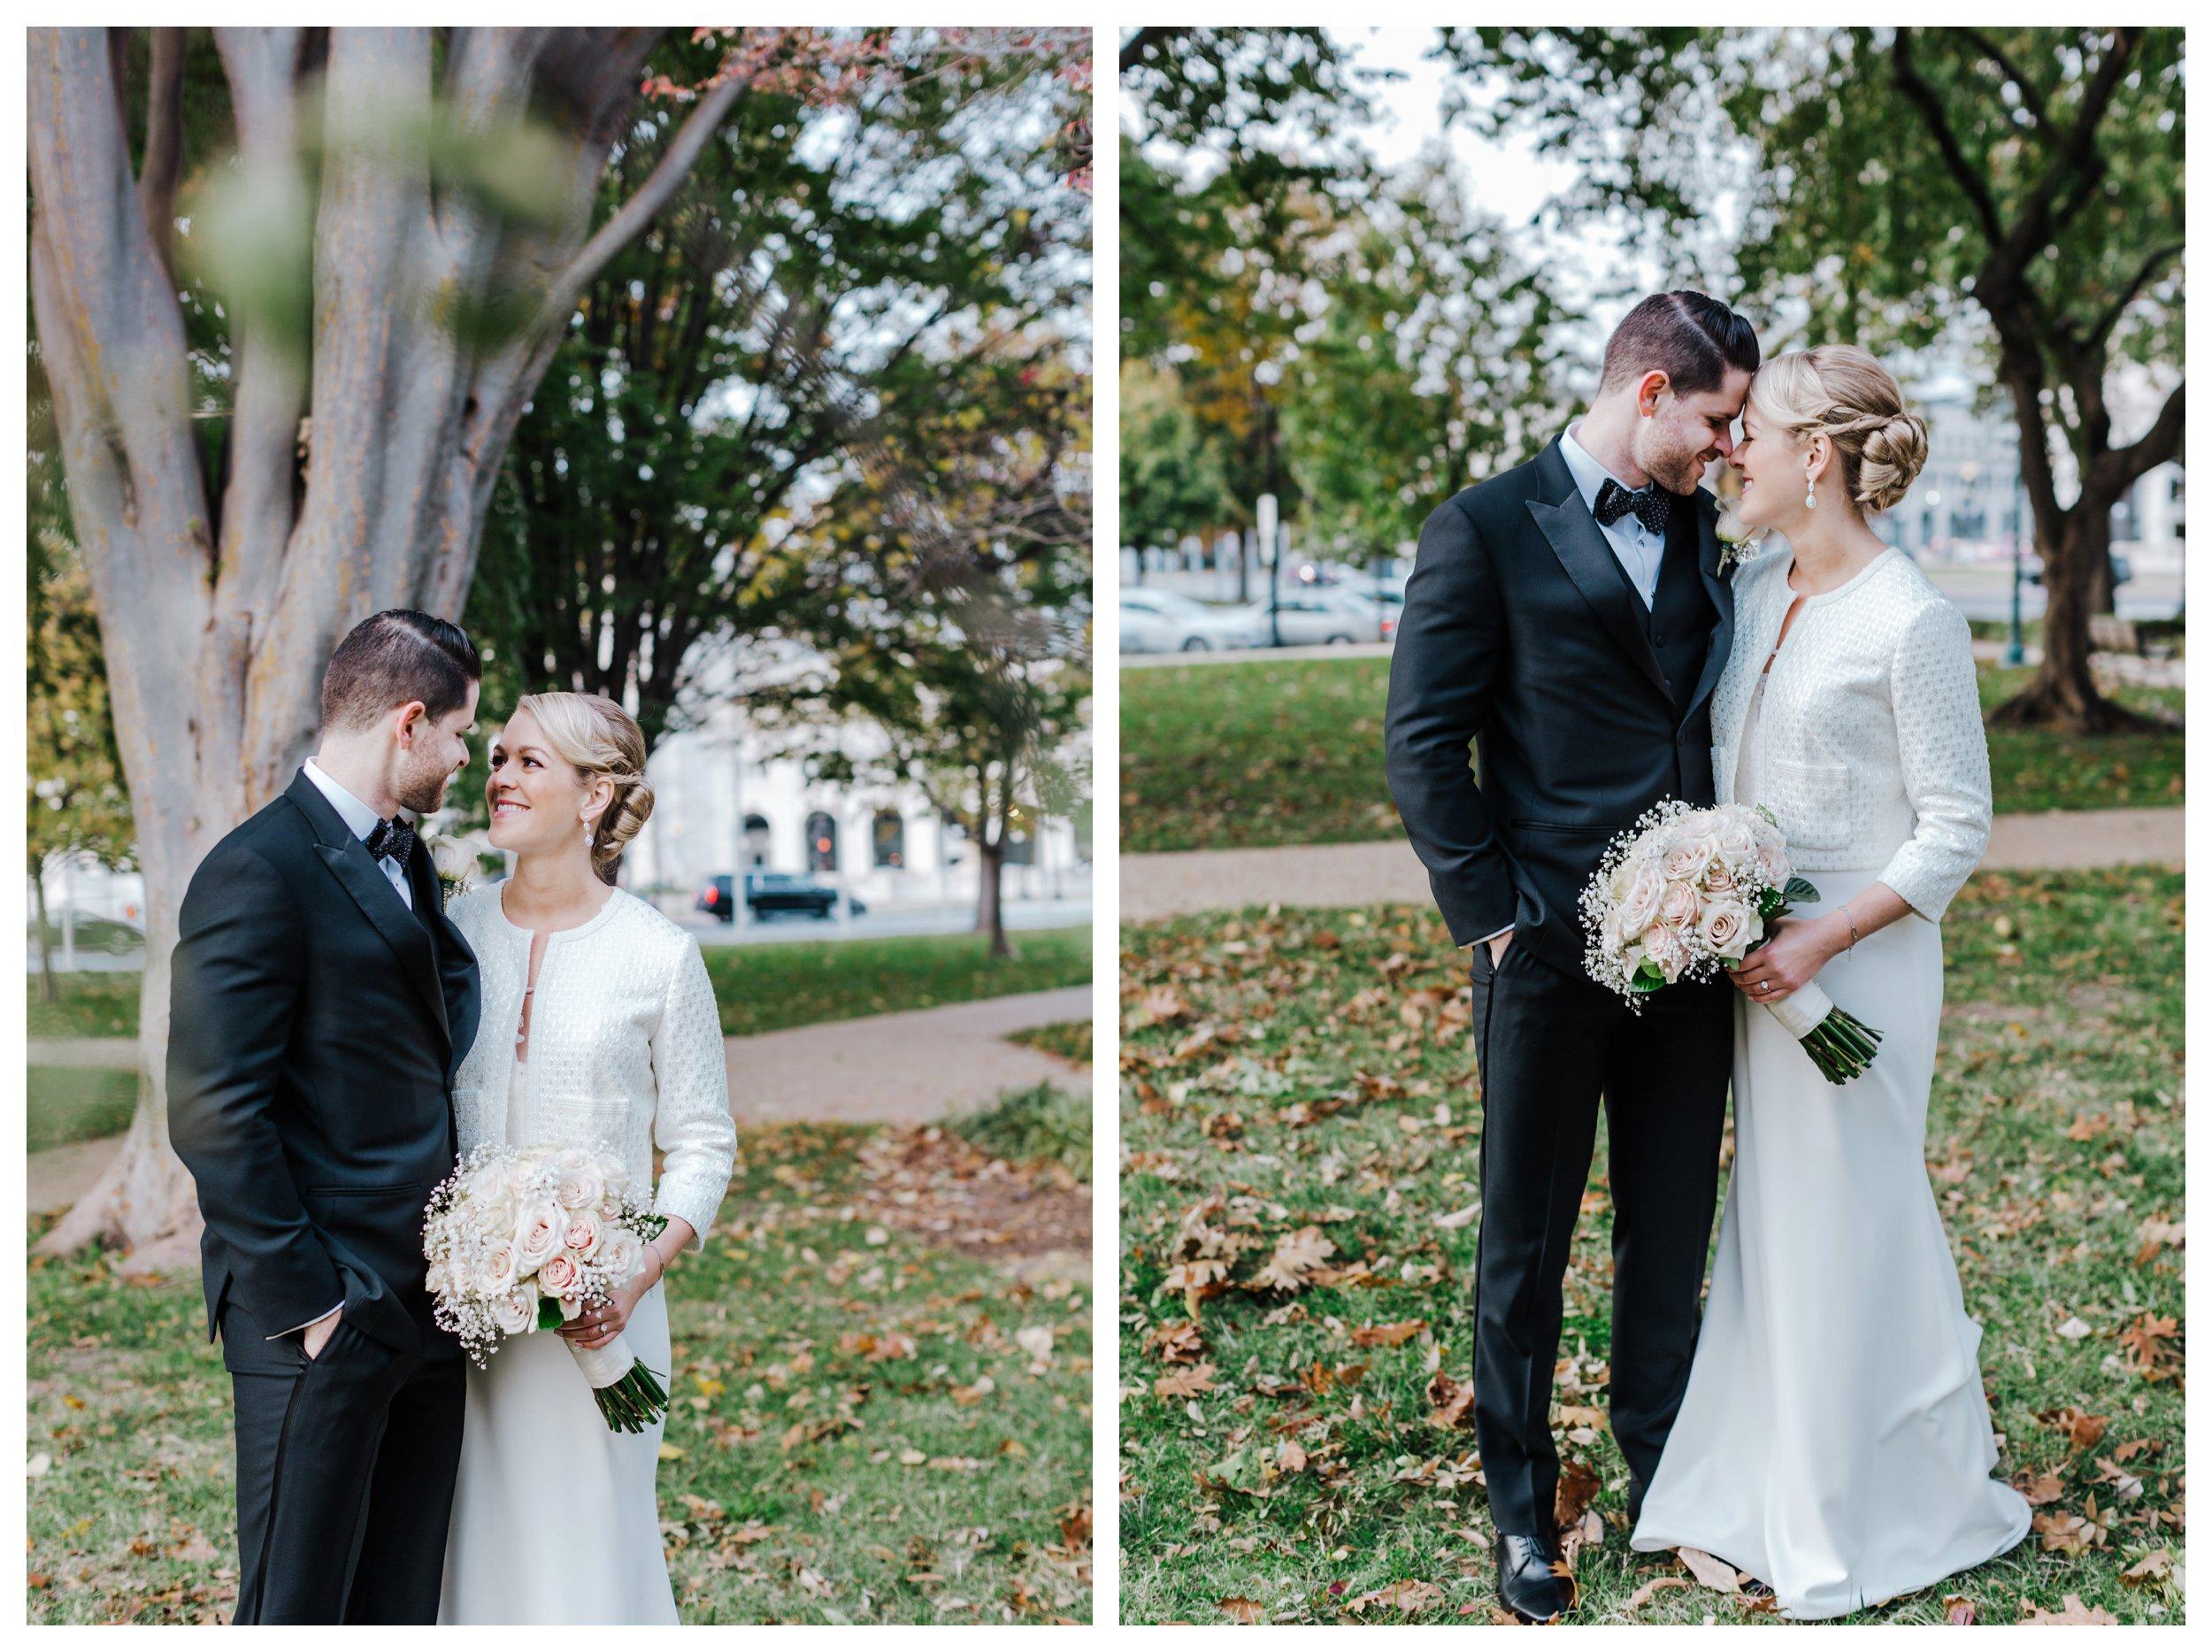 washington-dc-wedding-photographer-27.JPG